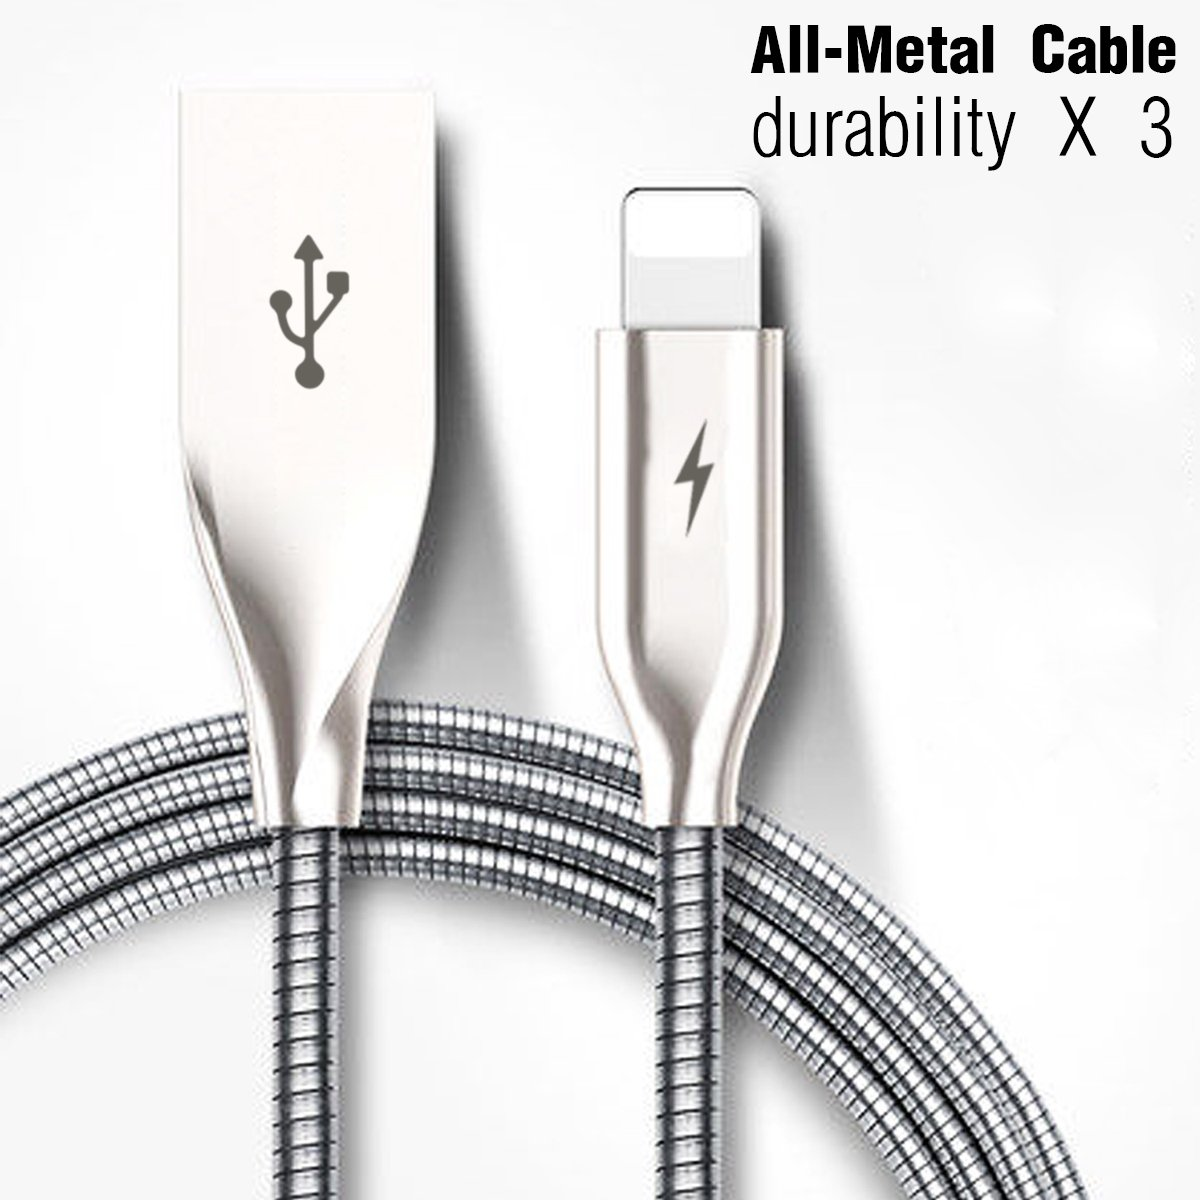 Yaletu iPhone ケーブル 充電 亜鉛合金 Lightning - USB ケーブル 充電 データ同期 コード iPhone6 7 7plus 6s 6splus SE 5s 5c 5 iPad Pro Air 2 Mini 4 2 用 - 3.3フィート - ラウンドヘッド ブラック 3 feet シルバー 4326452744 B06WWBYT2G 3.3Ft/1m lightning cable